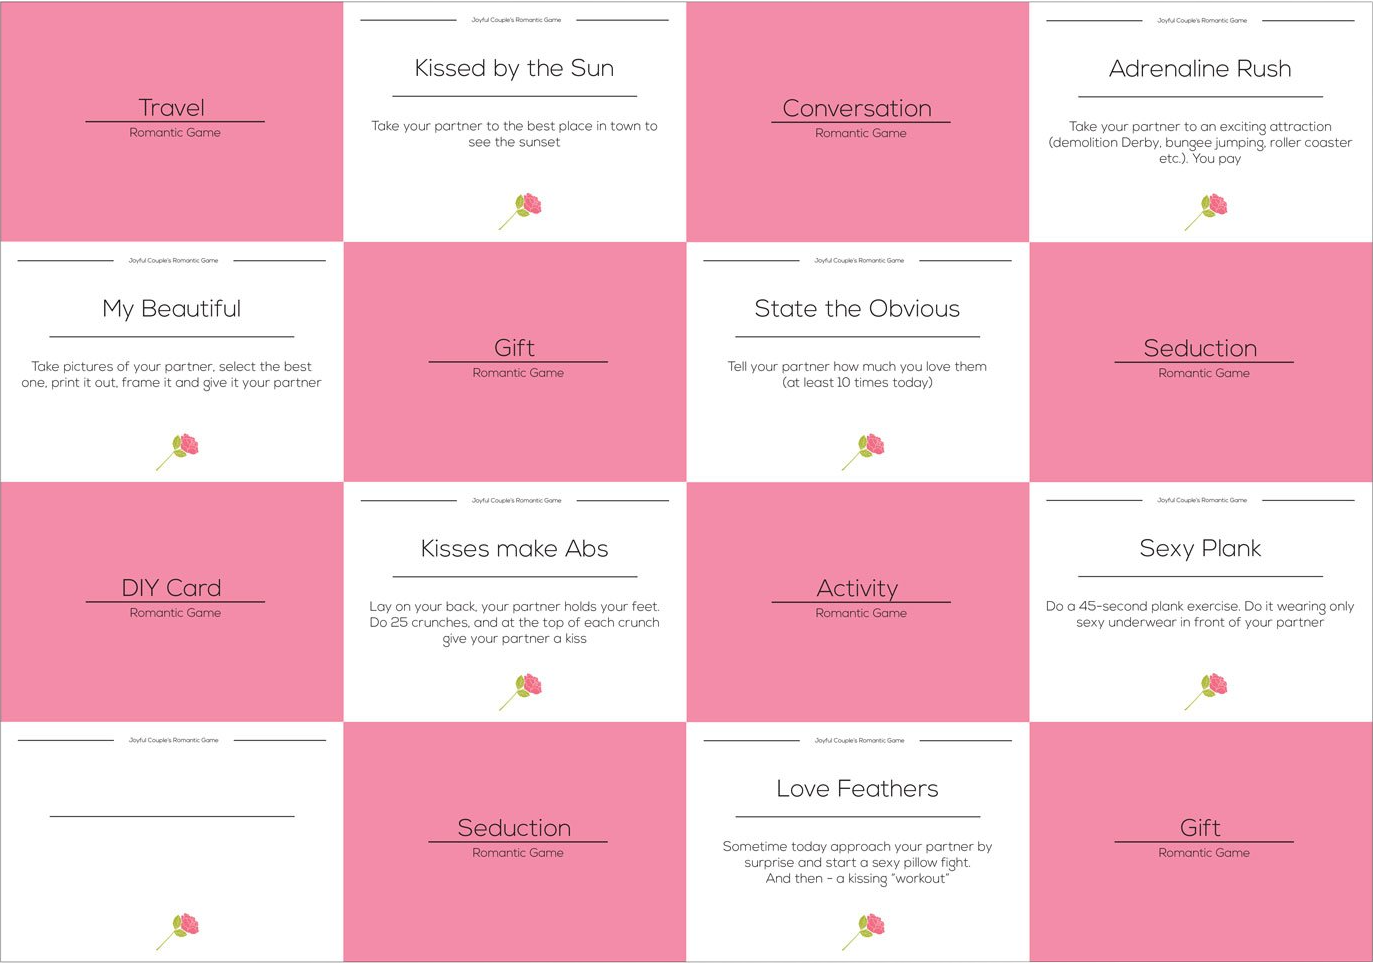 Joyful Couple Romantic Game example cards.